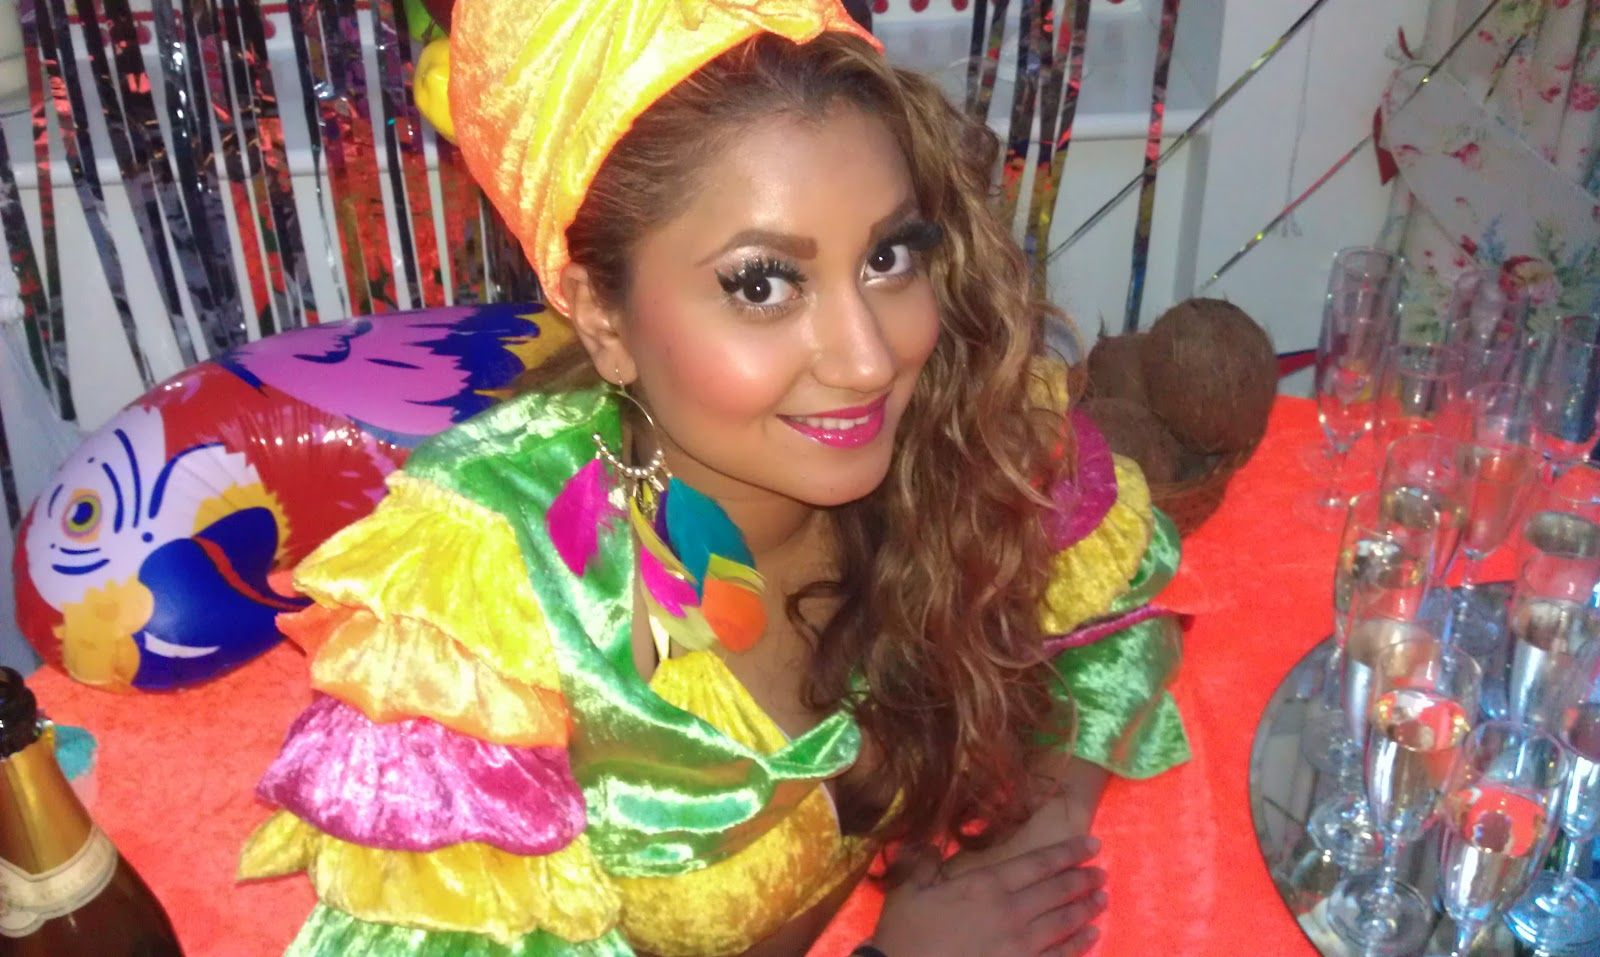 Summer Haute List | Havana nights party, Havana nights ...  |Caribbean Party Clothes